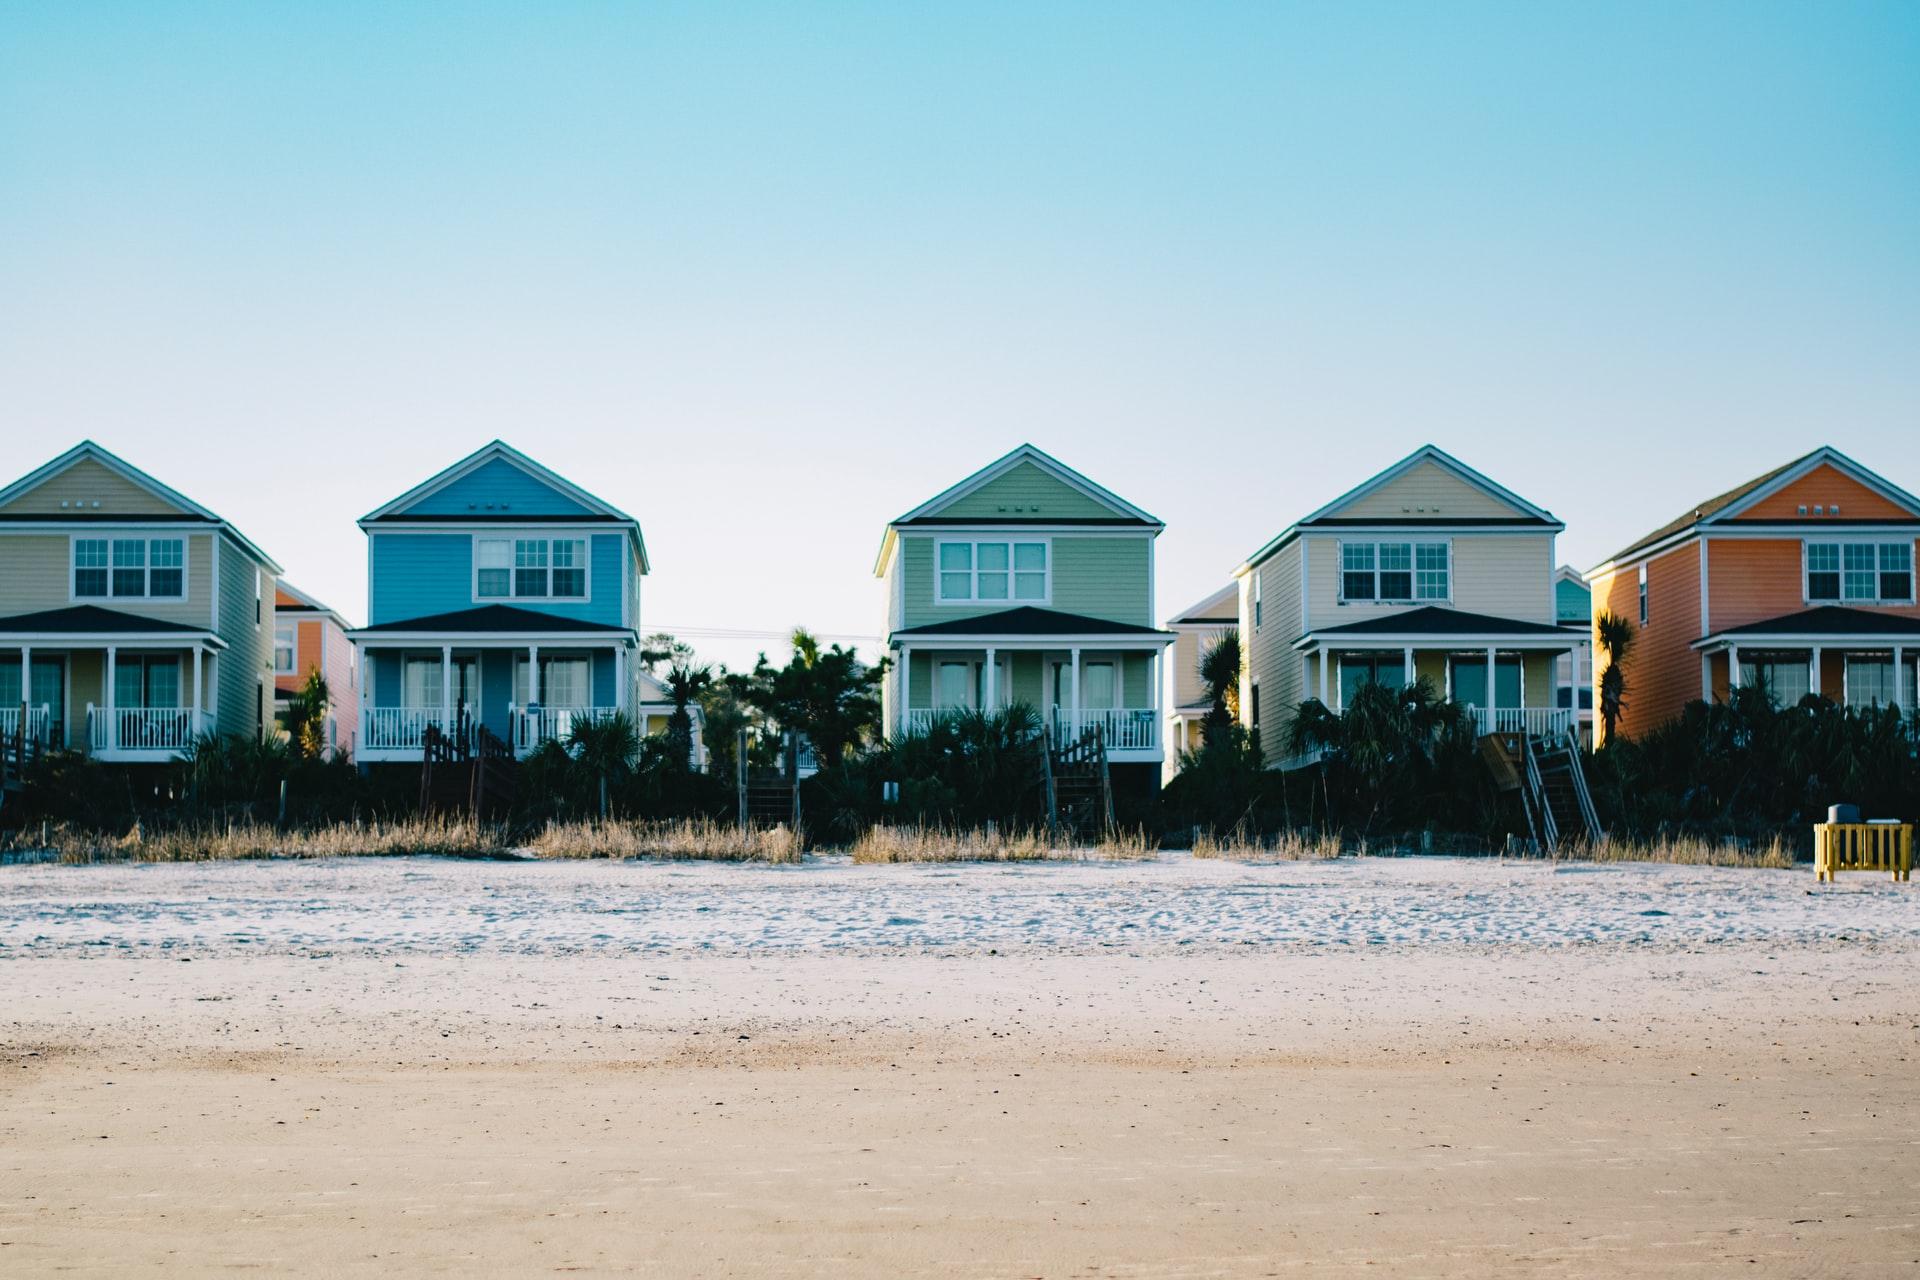 Choosing Windows for a Coastal Home